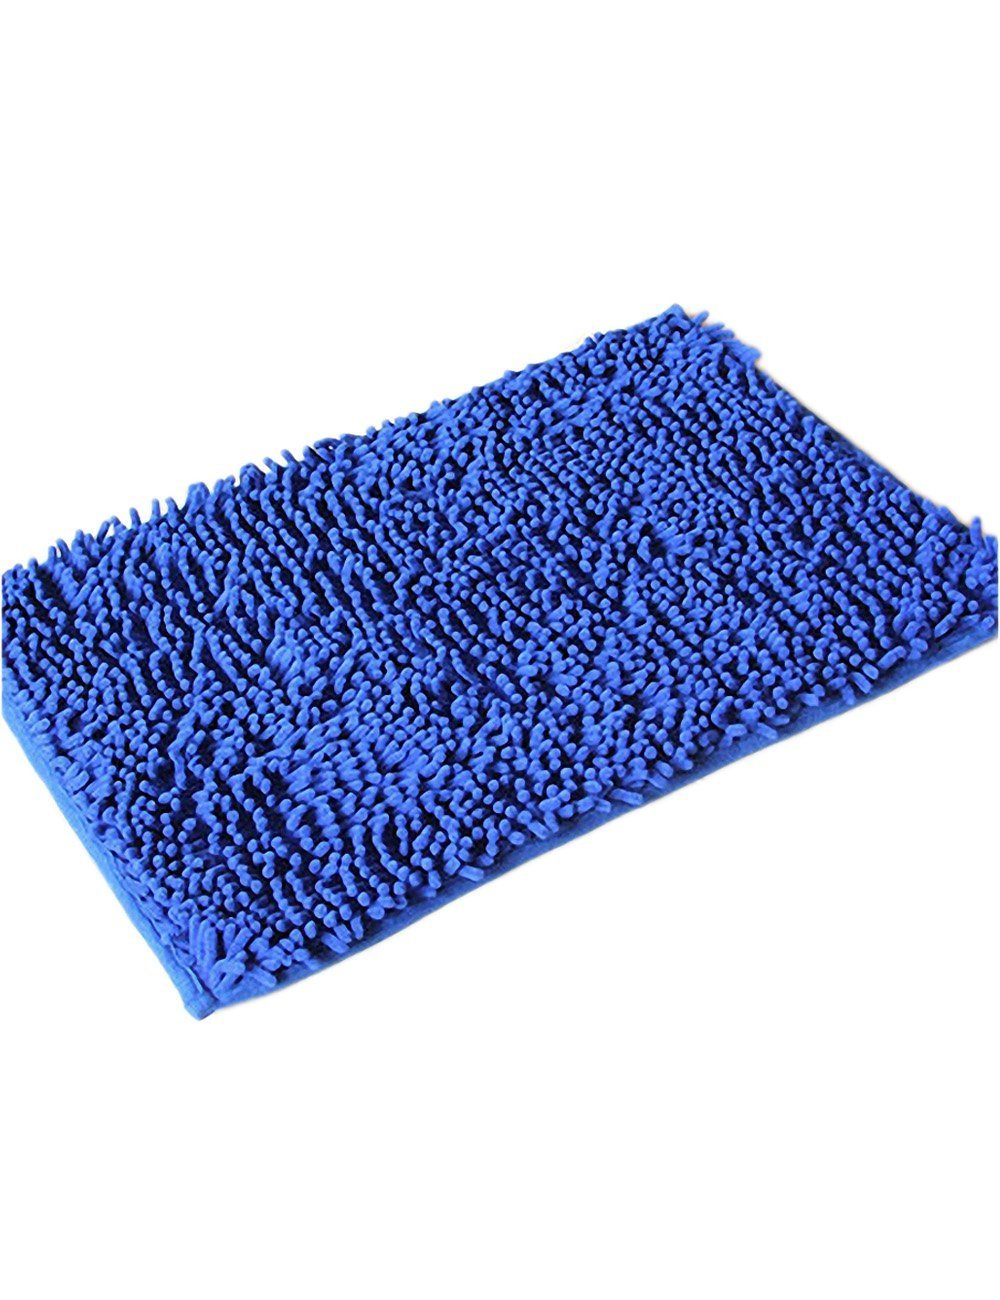 Get Quotations Adasmile Soft Gy Non Slip Microfiber Bath Mat Bathroom Mats Shower Rugs Carpet For Tub